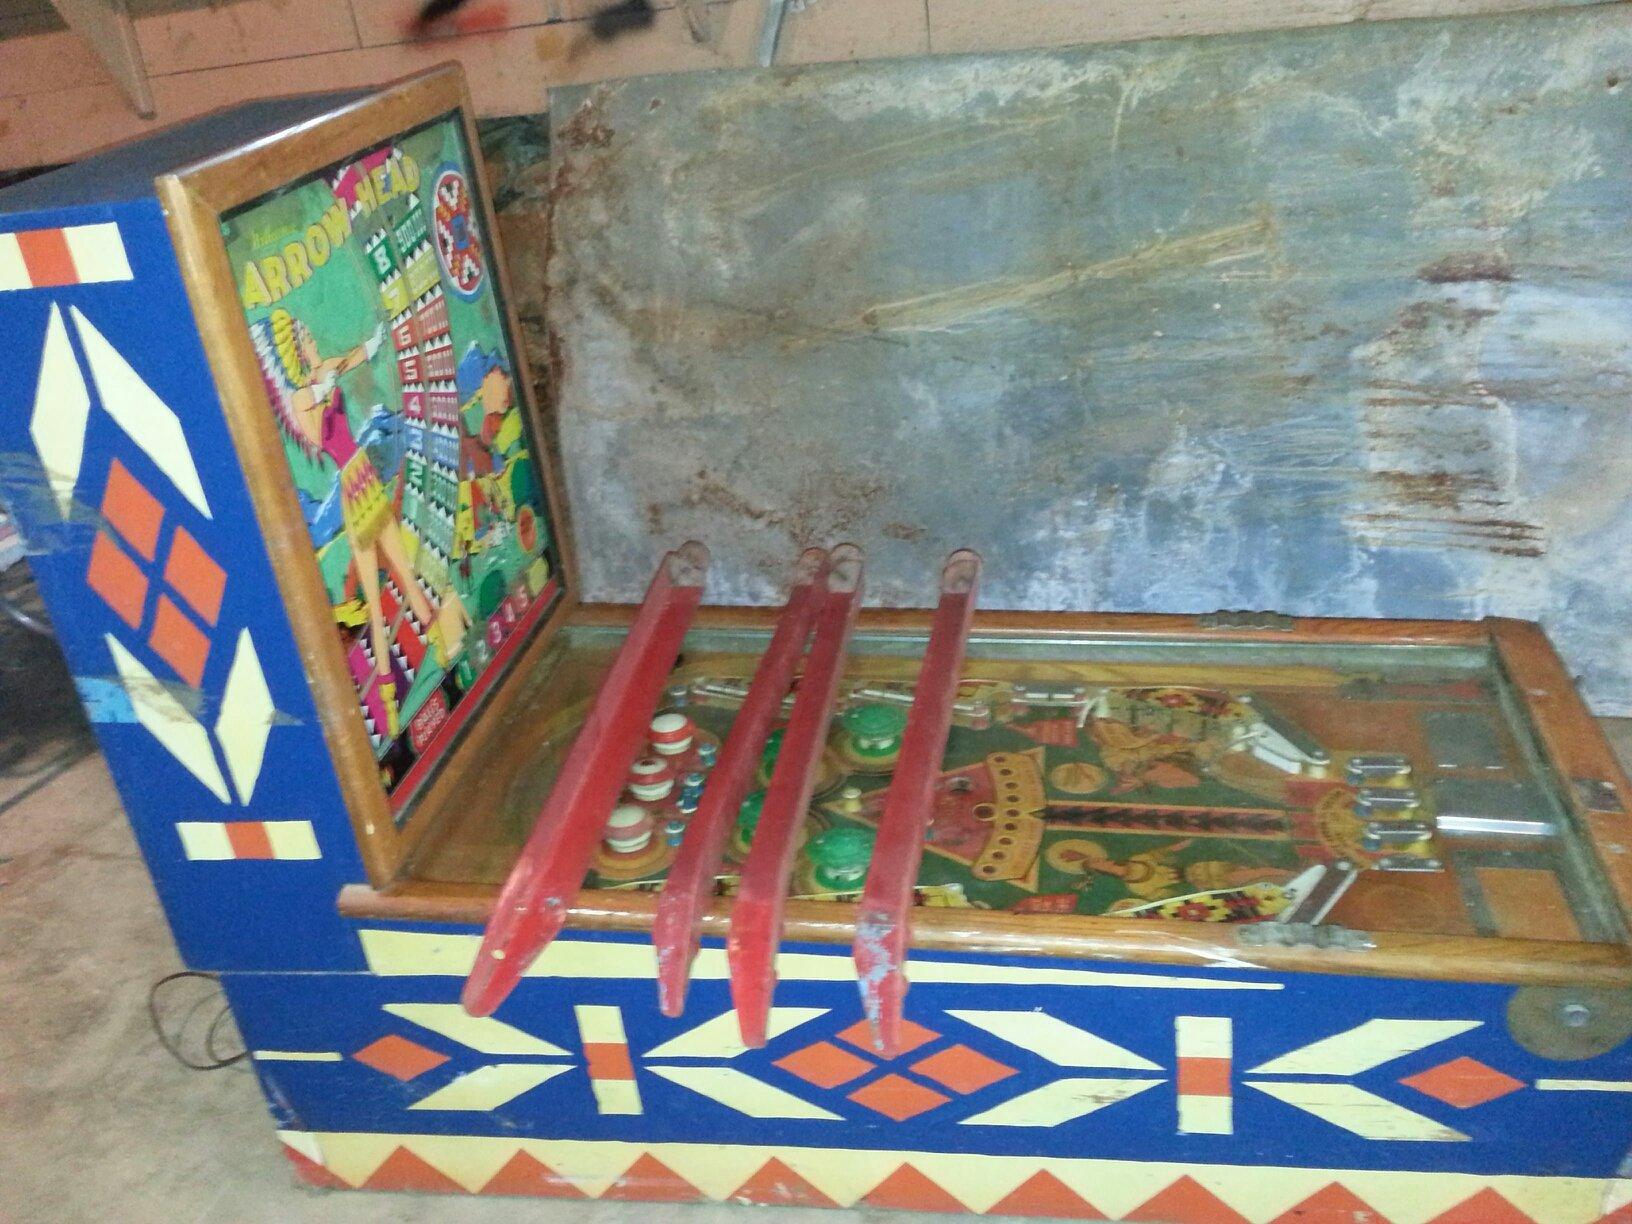 Arrow Head Woodrail Pinball Machine For Sale Kansas City